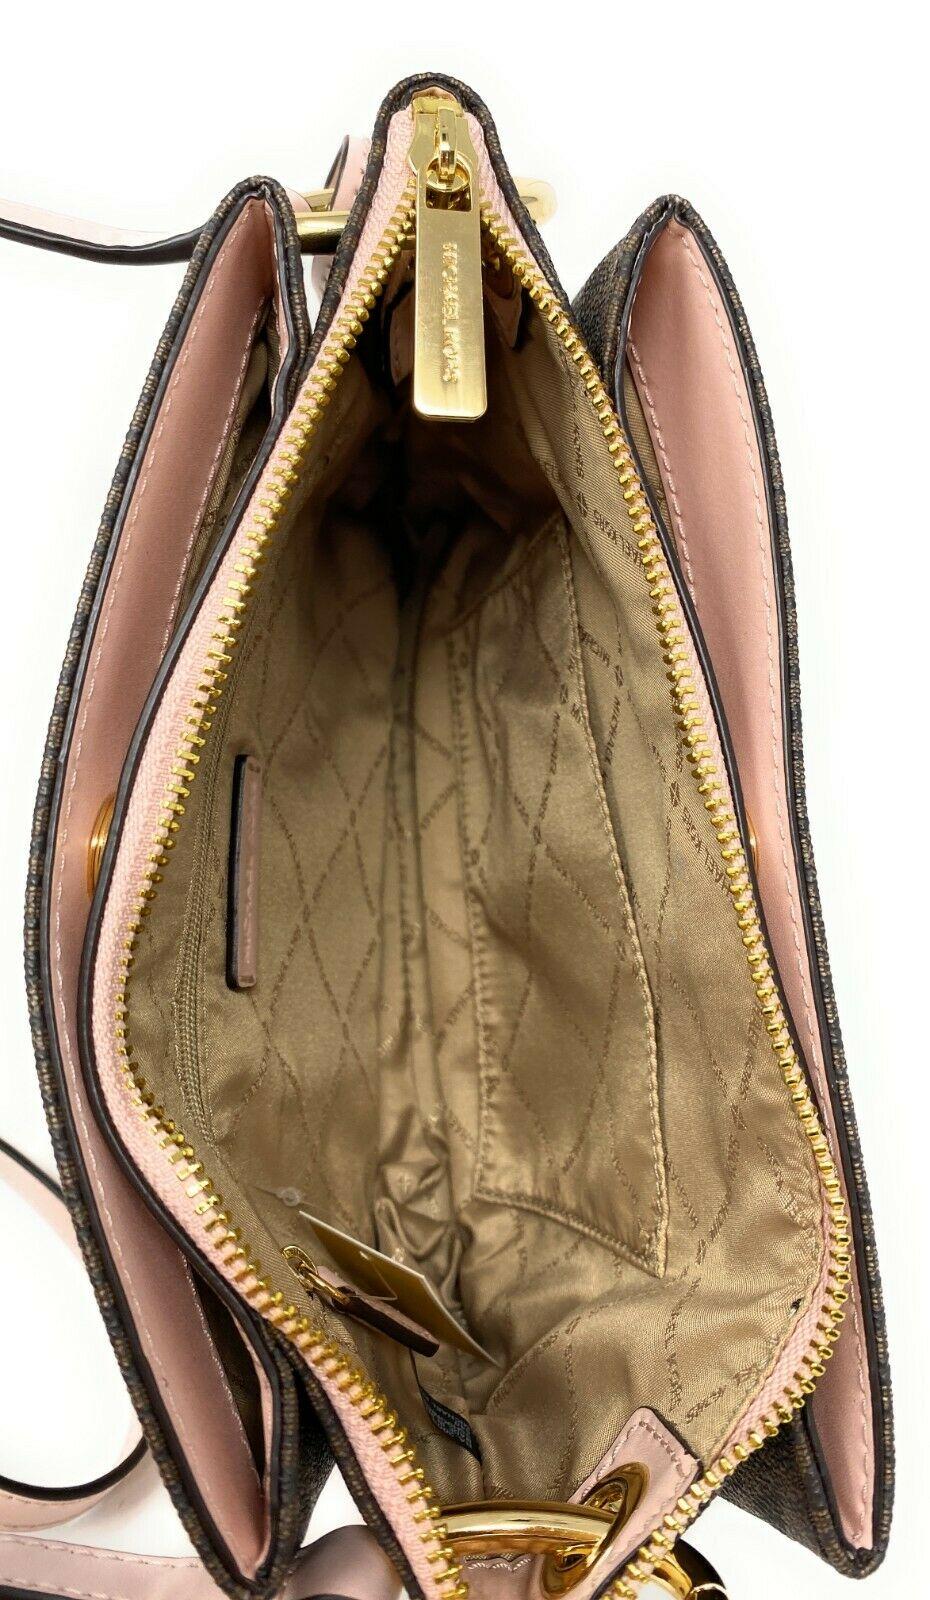 thumbnail 13 - Michael Kors Nicole Large Triple Compartment Crossbody Bag MK Purse